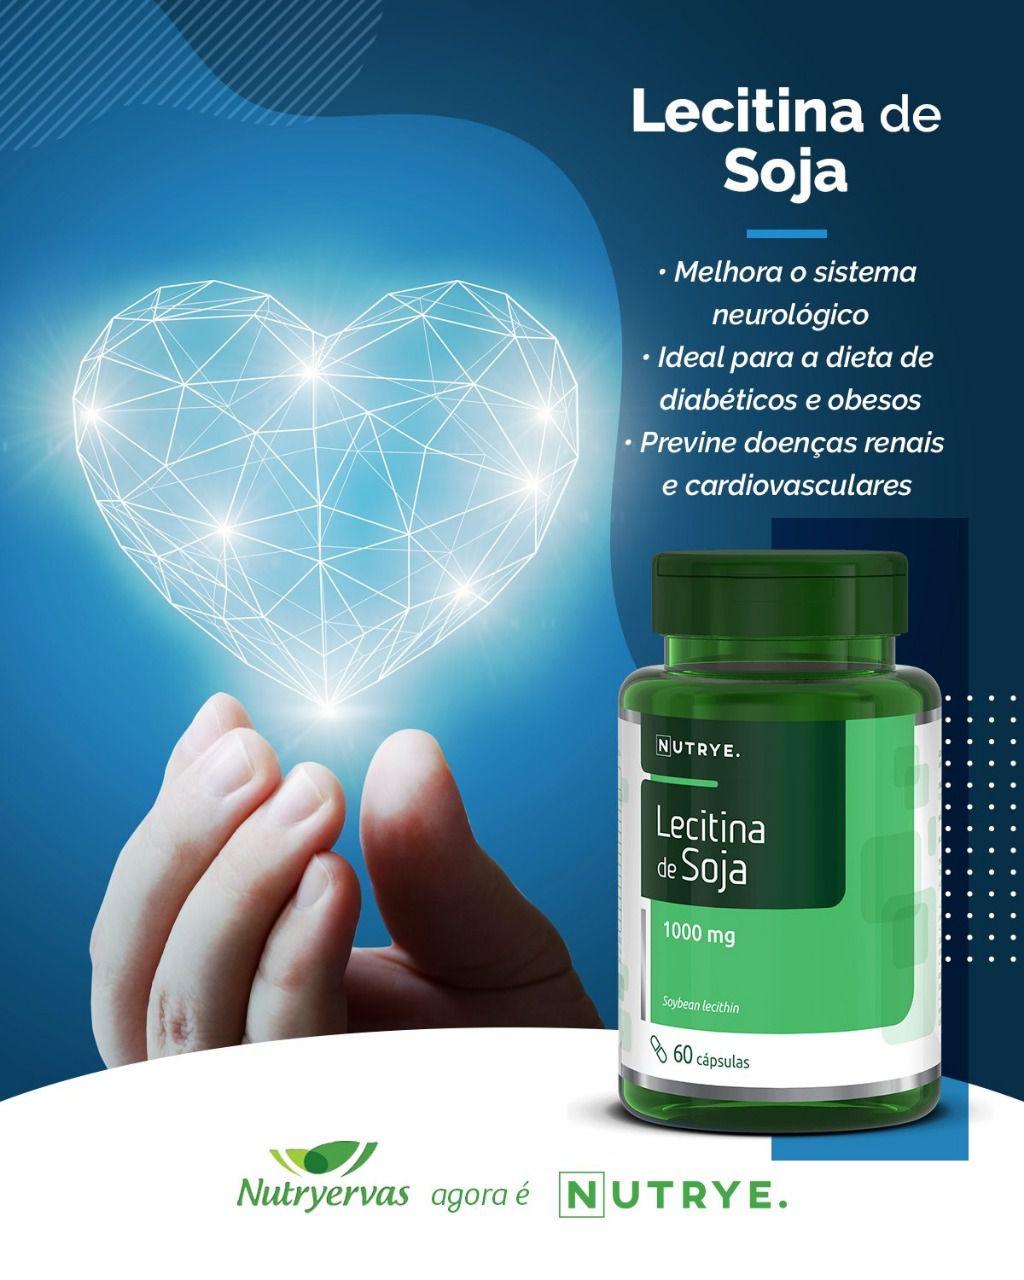 LECITINA DE SOJA 60 CÁPSULAS - NUTRYE